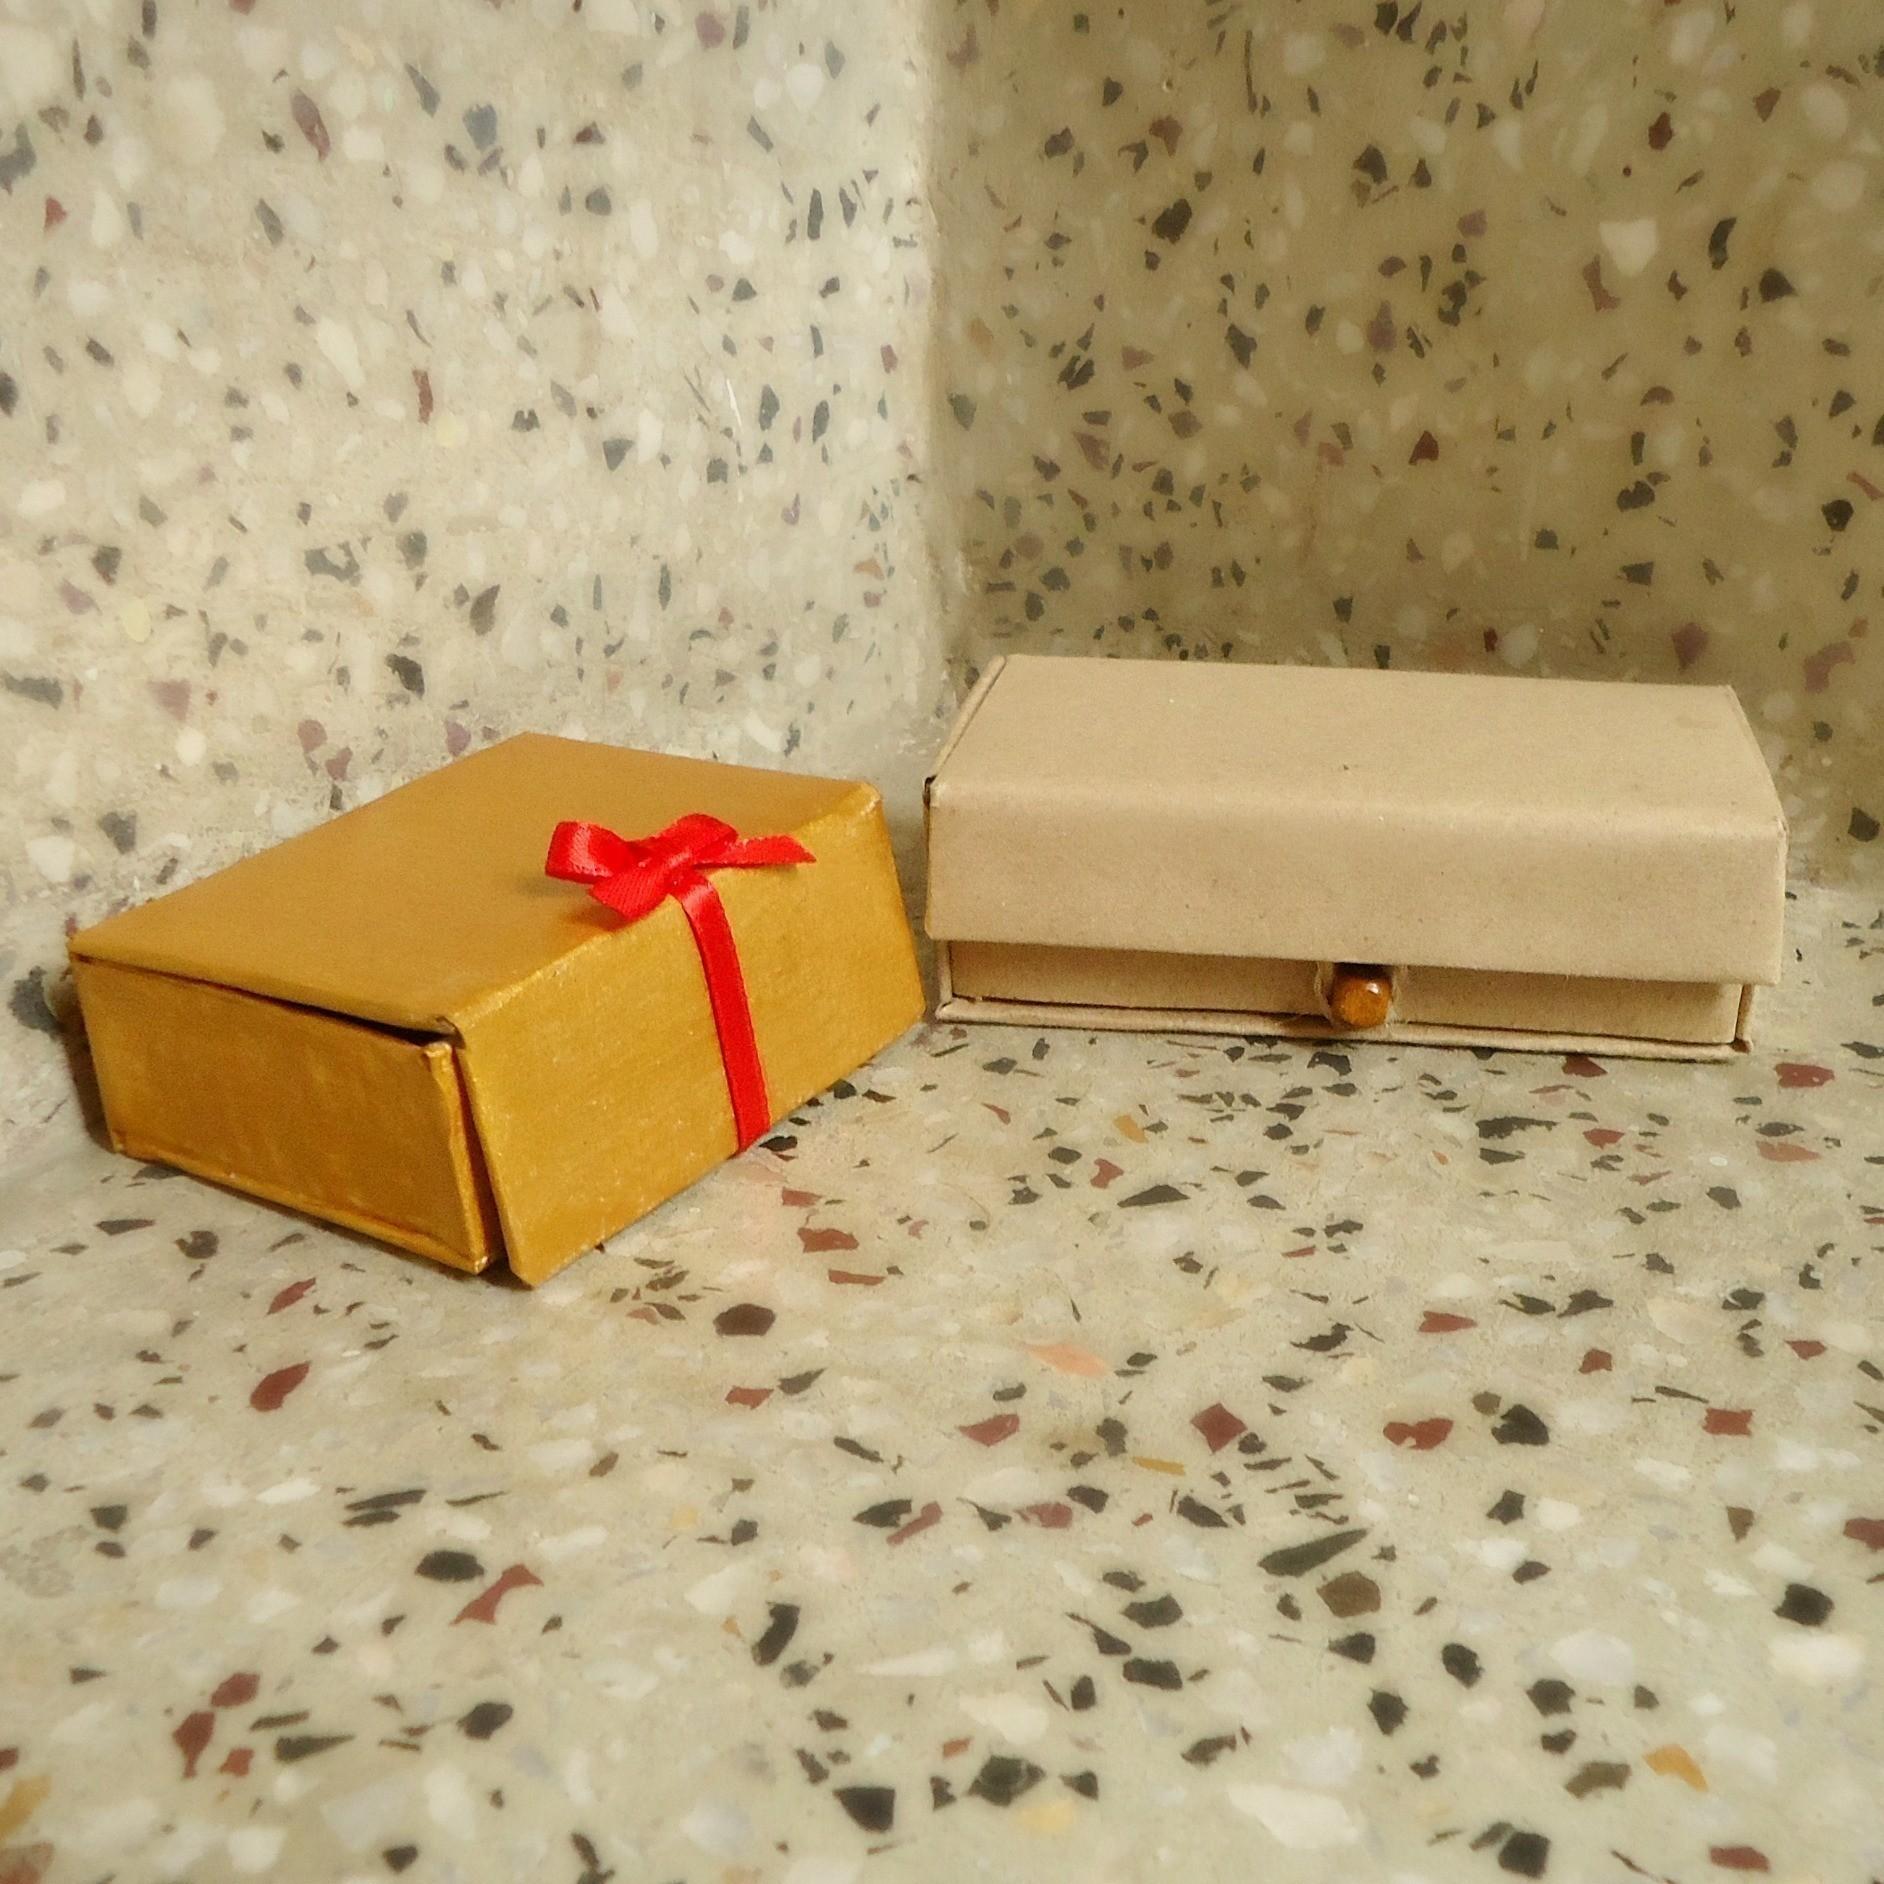 Make A Vintage Cardboard Box · How To Make A Box · Art on Cut Out + Keep